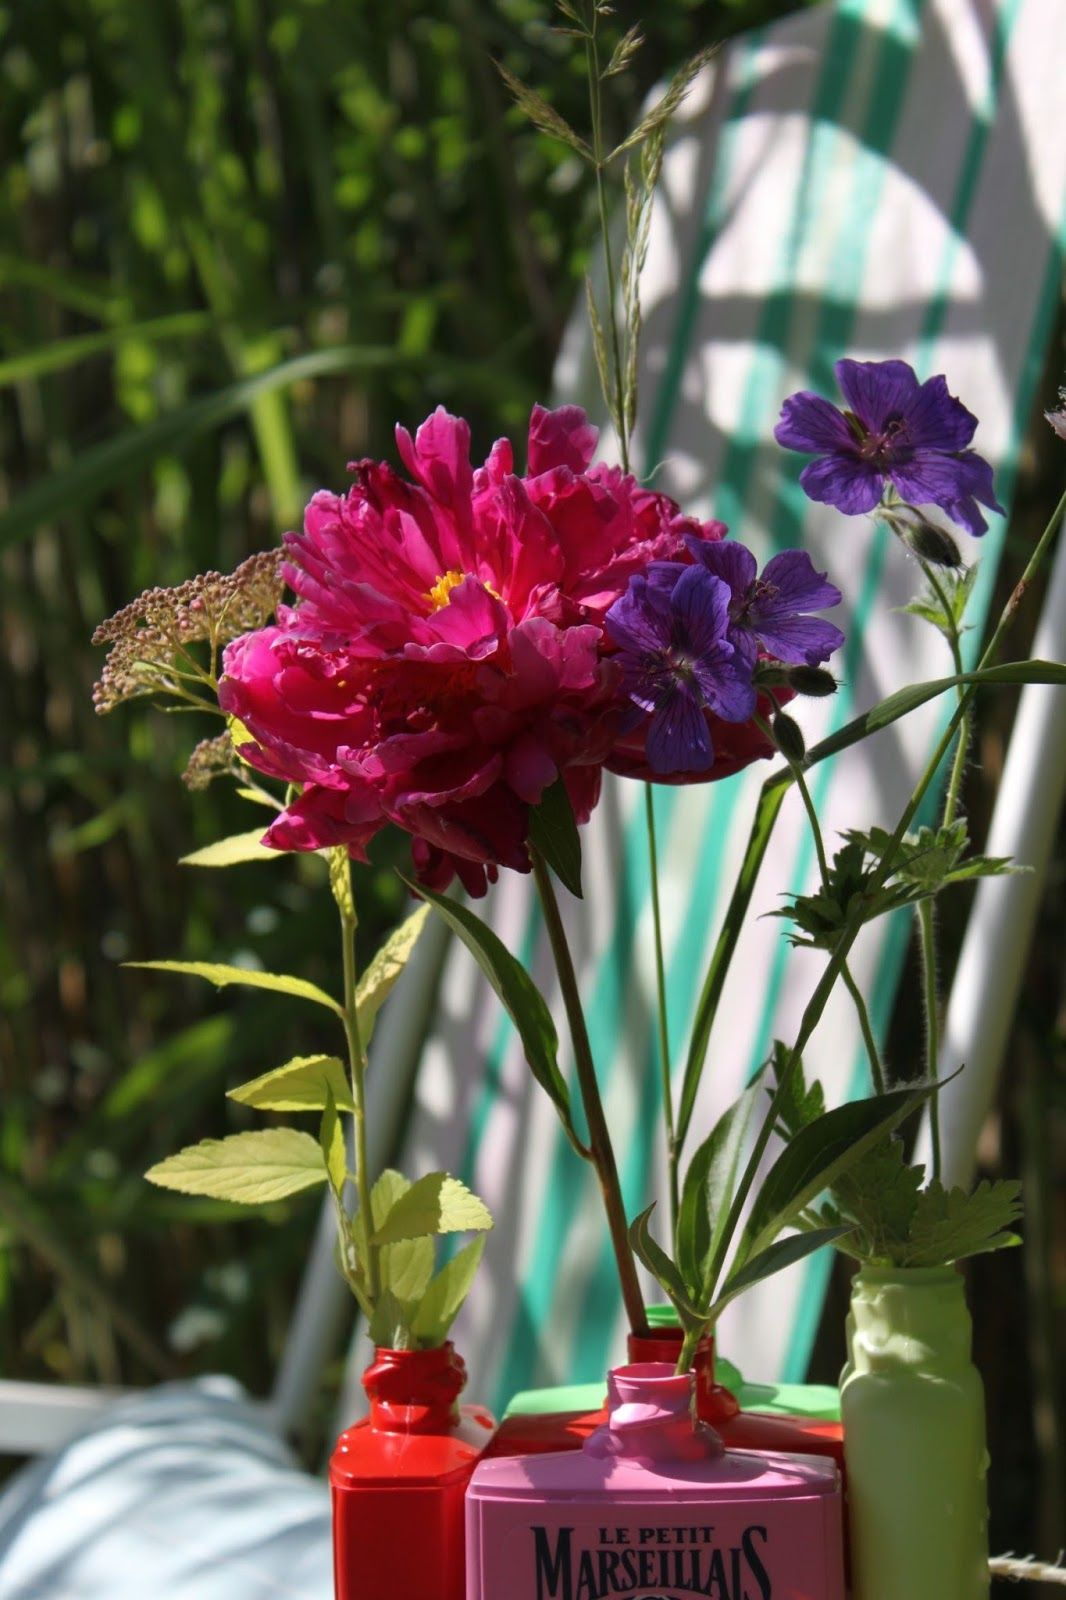 Flowers from my garden!